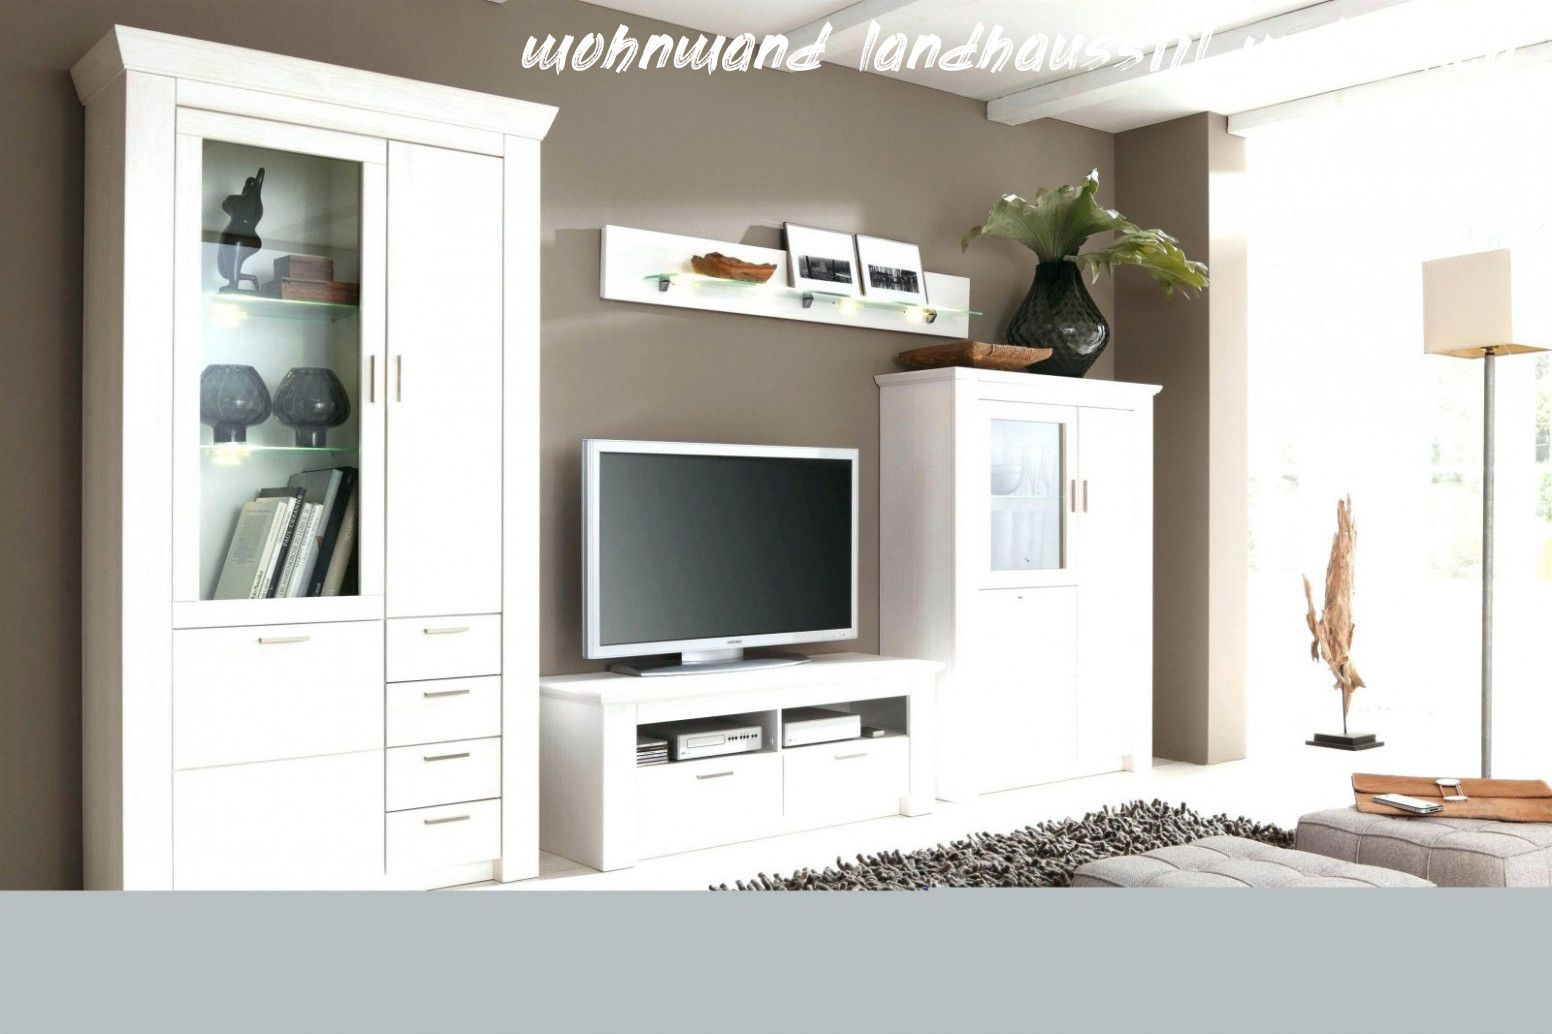 8 Wohnwand Landhausstil Weiss Ikea In 2020 Home Decor Home Diy House Plans